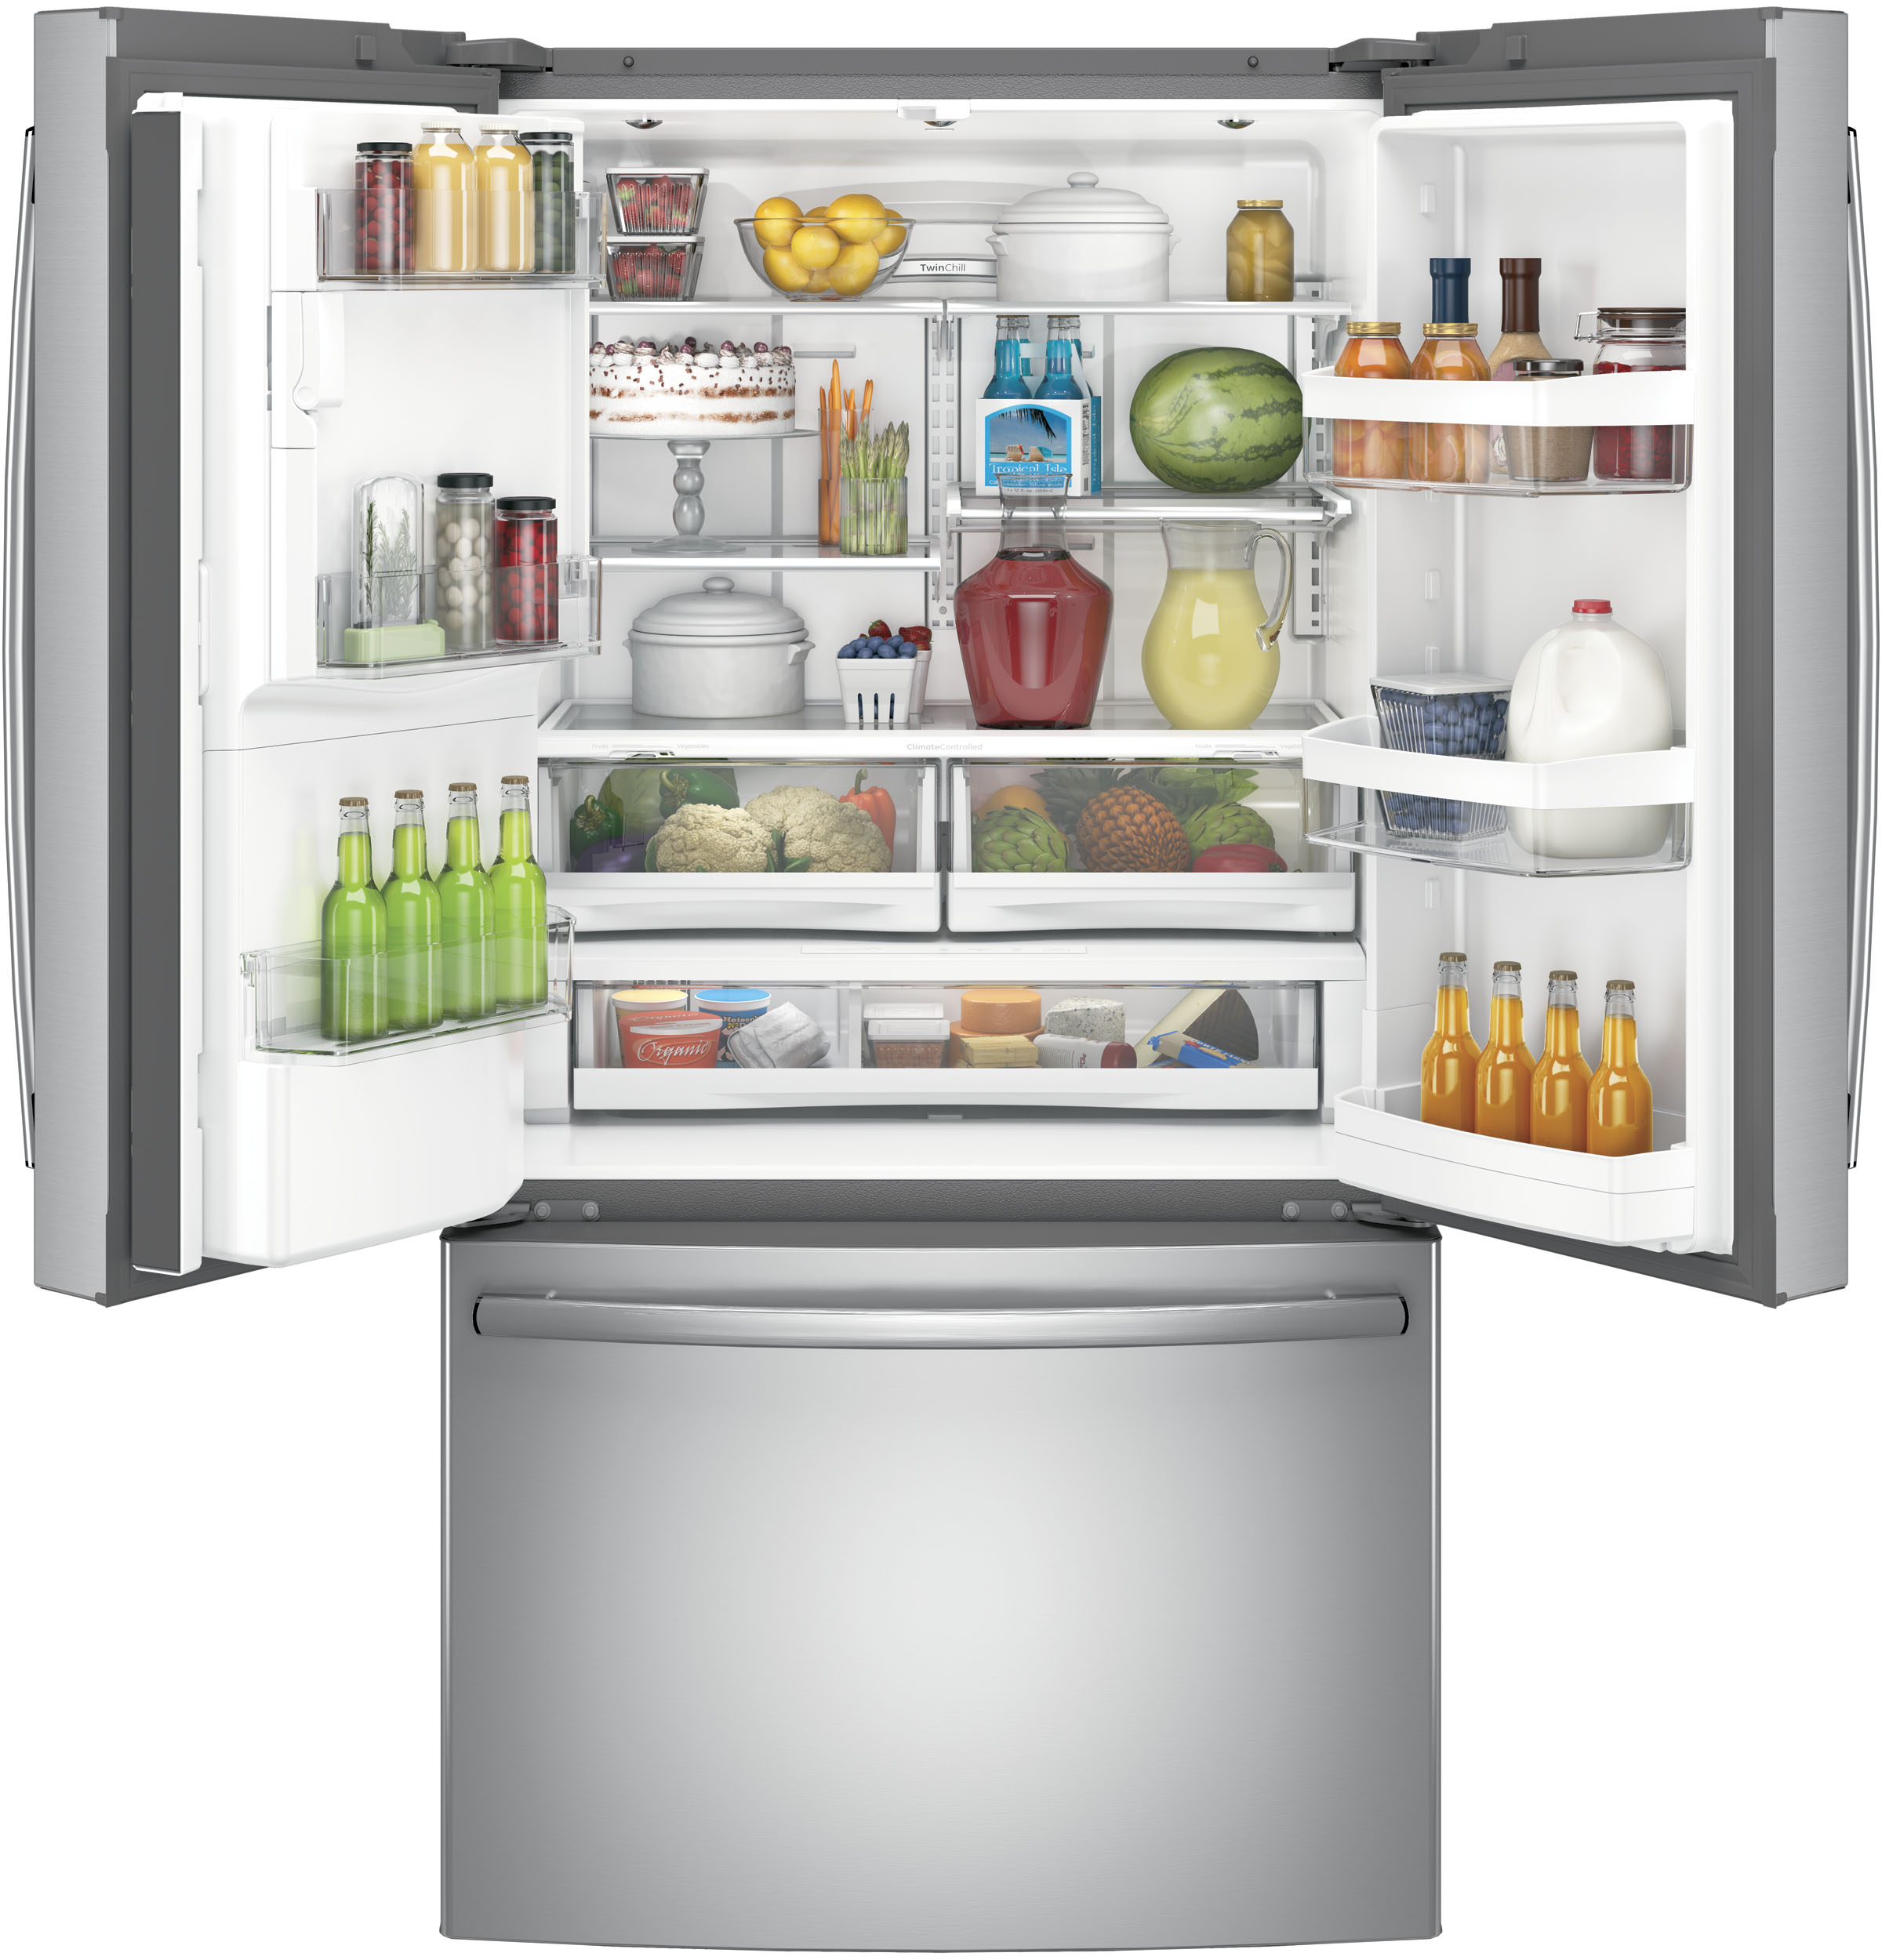 Model: GFE28HSKSS | GE® ENERGY STAR® 27.8 Cu. Ft. French-Door Refrigerator